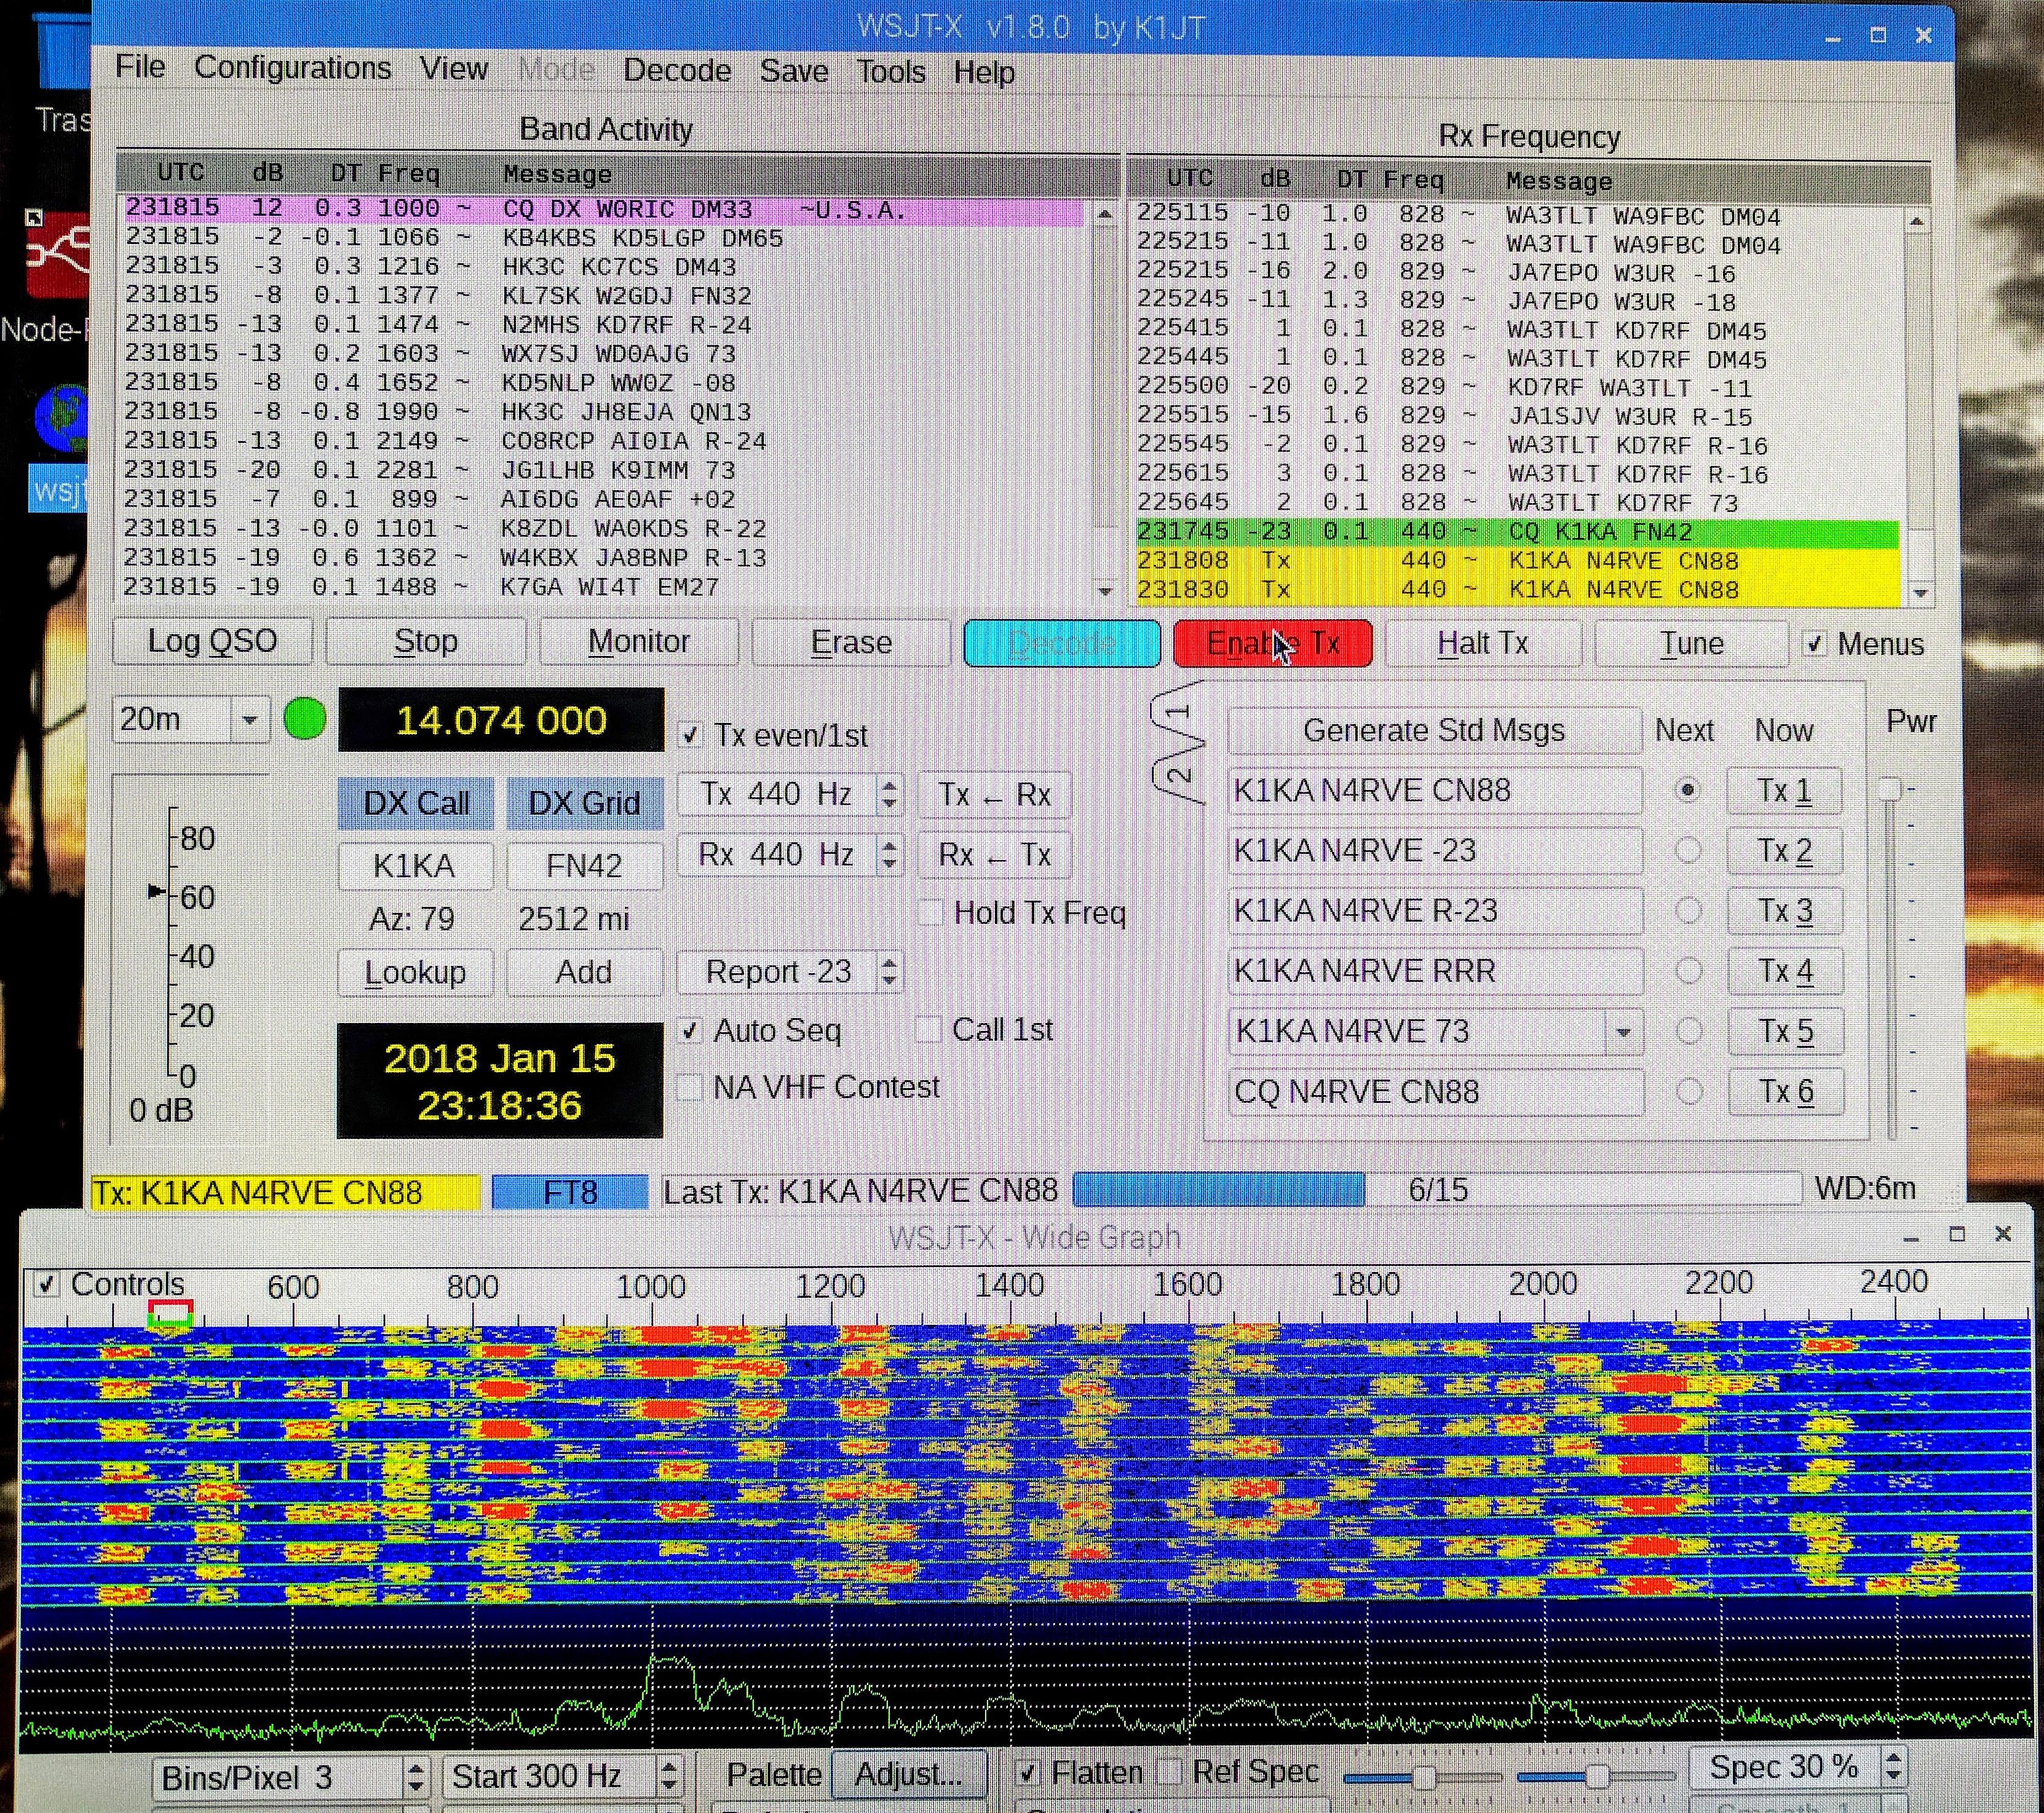 ft8-20m-screen